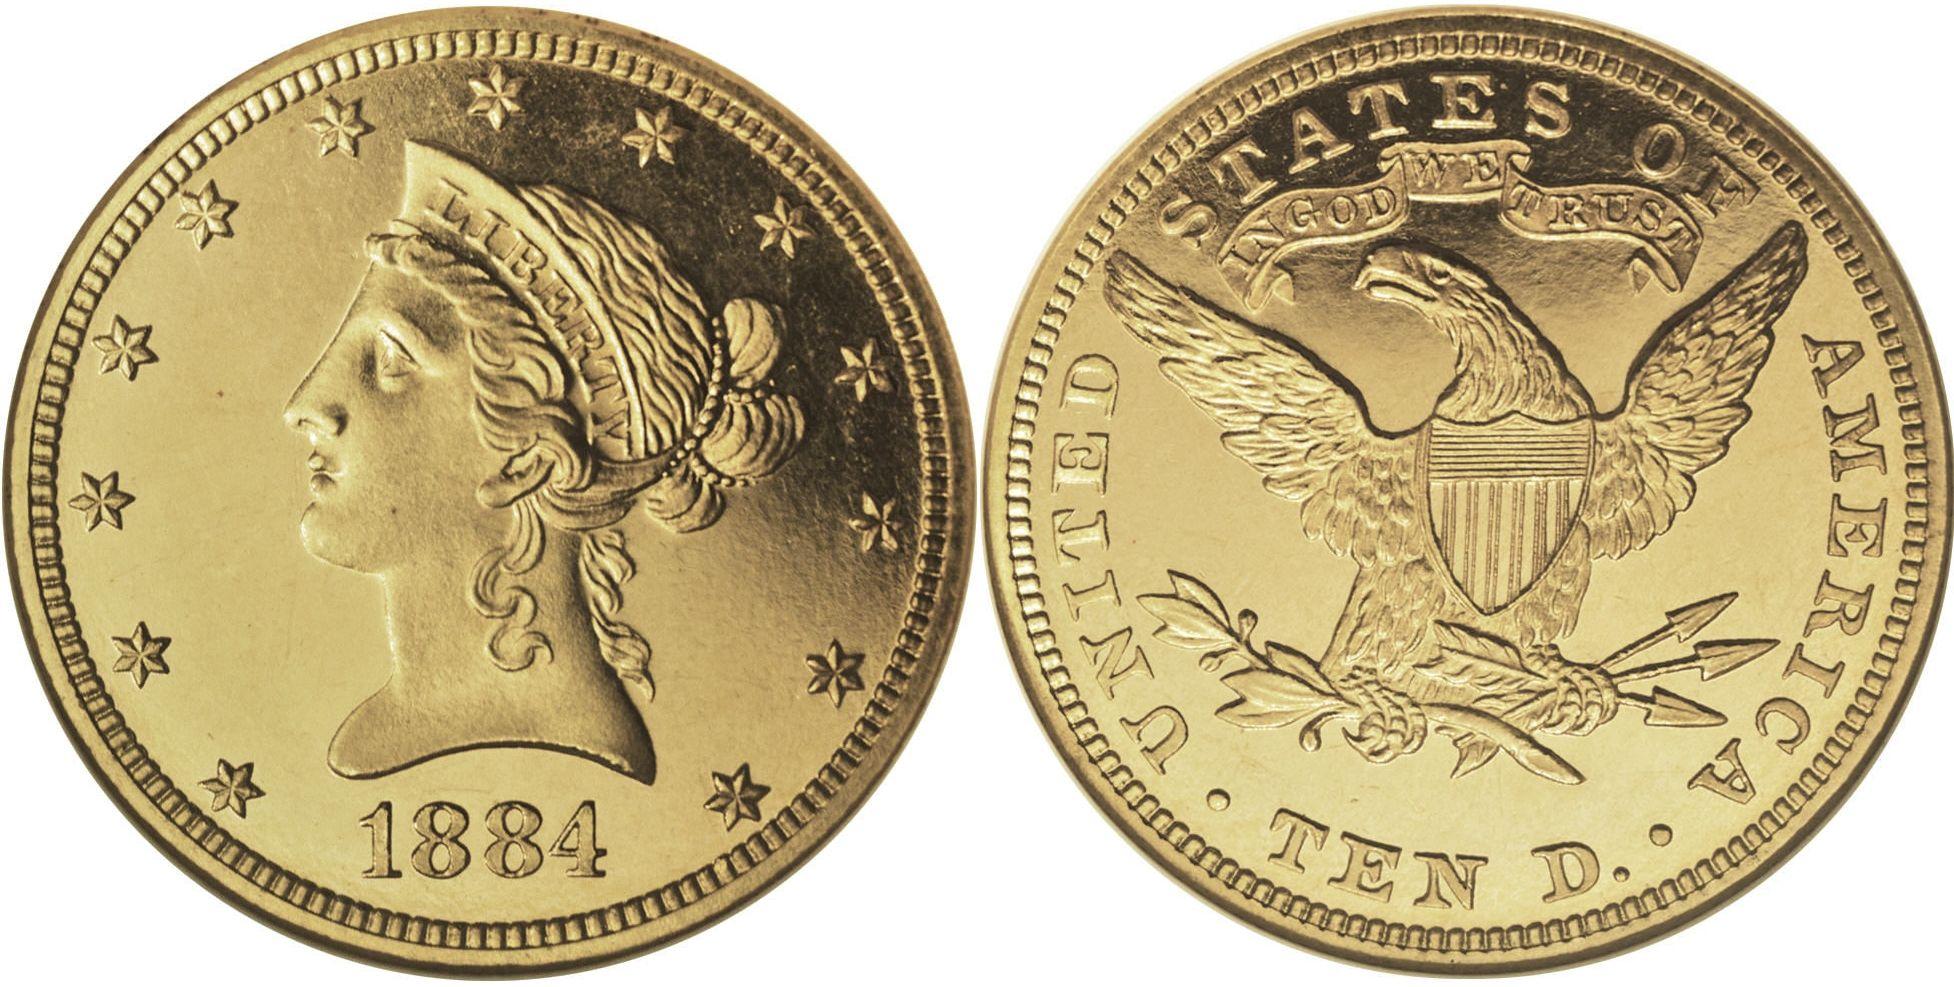 2014 2015 2016 S Proof Jefferson Nickel PCGS PR69DCAM 3 Coin Set